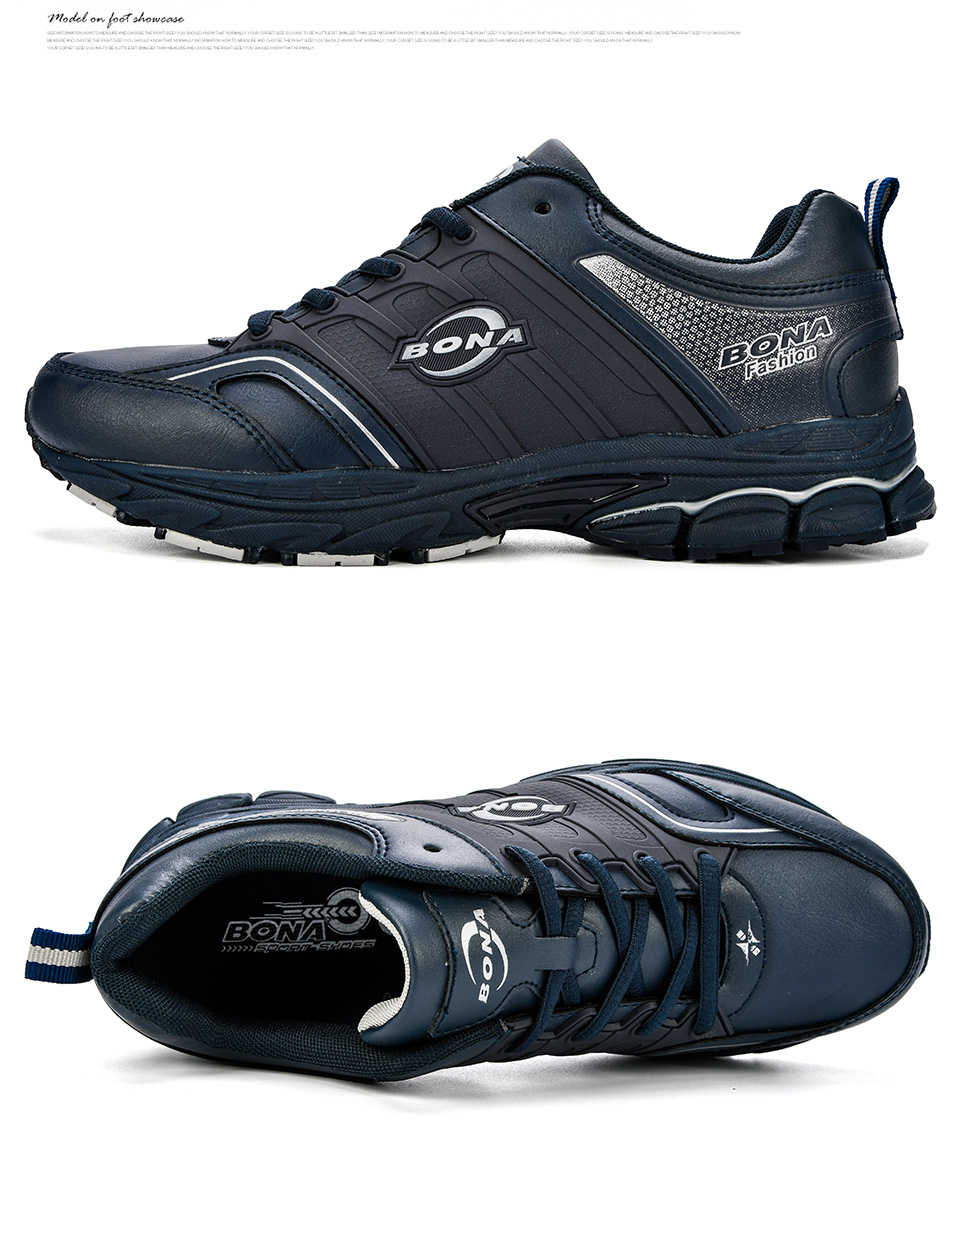 BONA Men Casual Shoes Microfiber Man Flats Lace Up Breathable Men Fashion Classic Outdoor Shoes Zapatos De Hombre Free Shipping